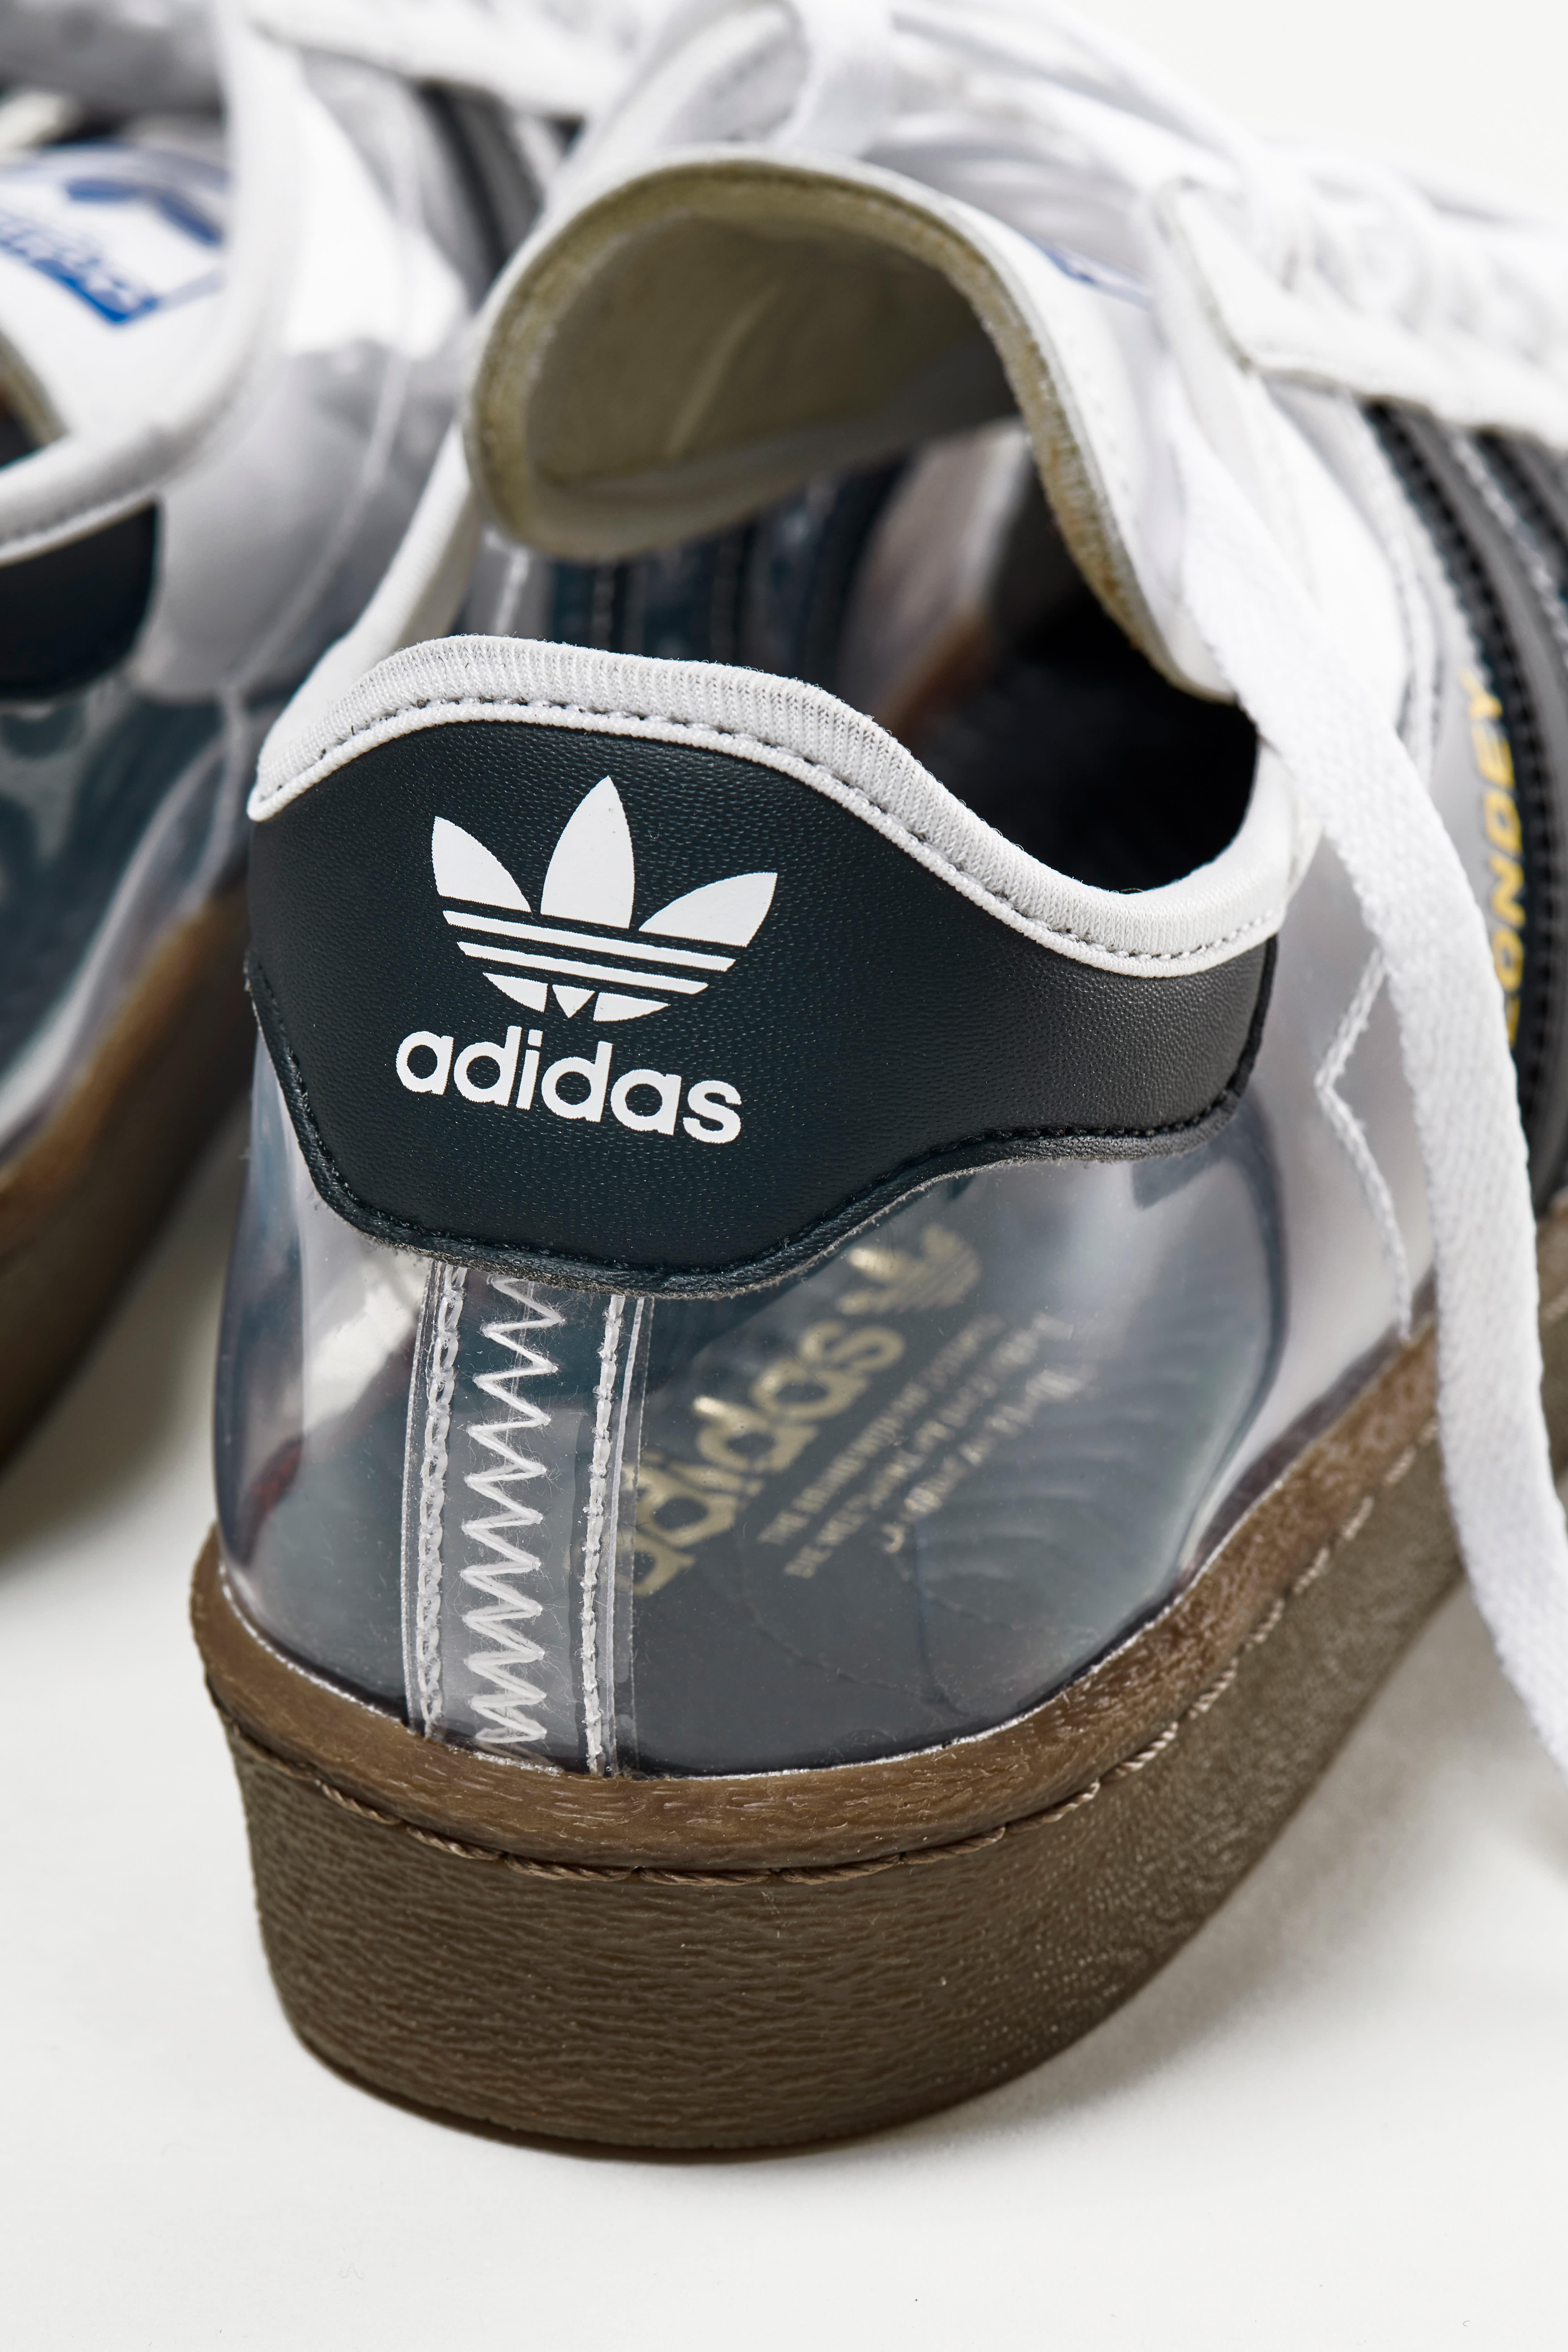 blondey-mccoy-adidas-superstar-80-heel